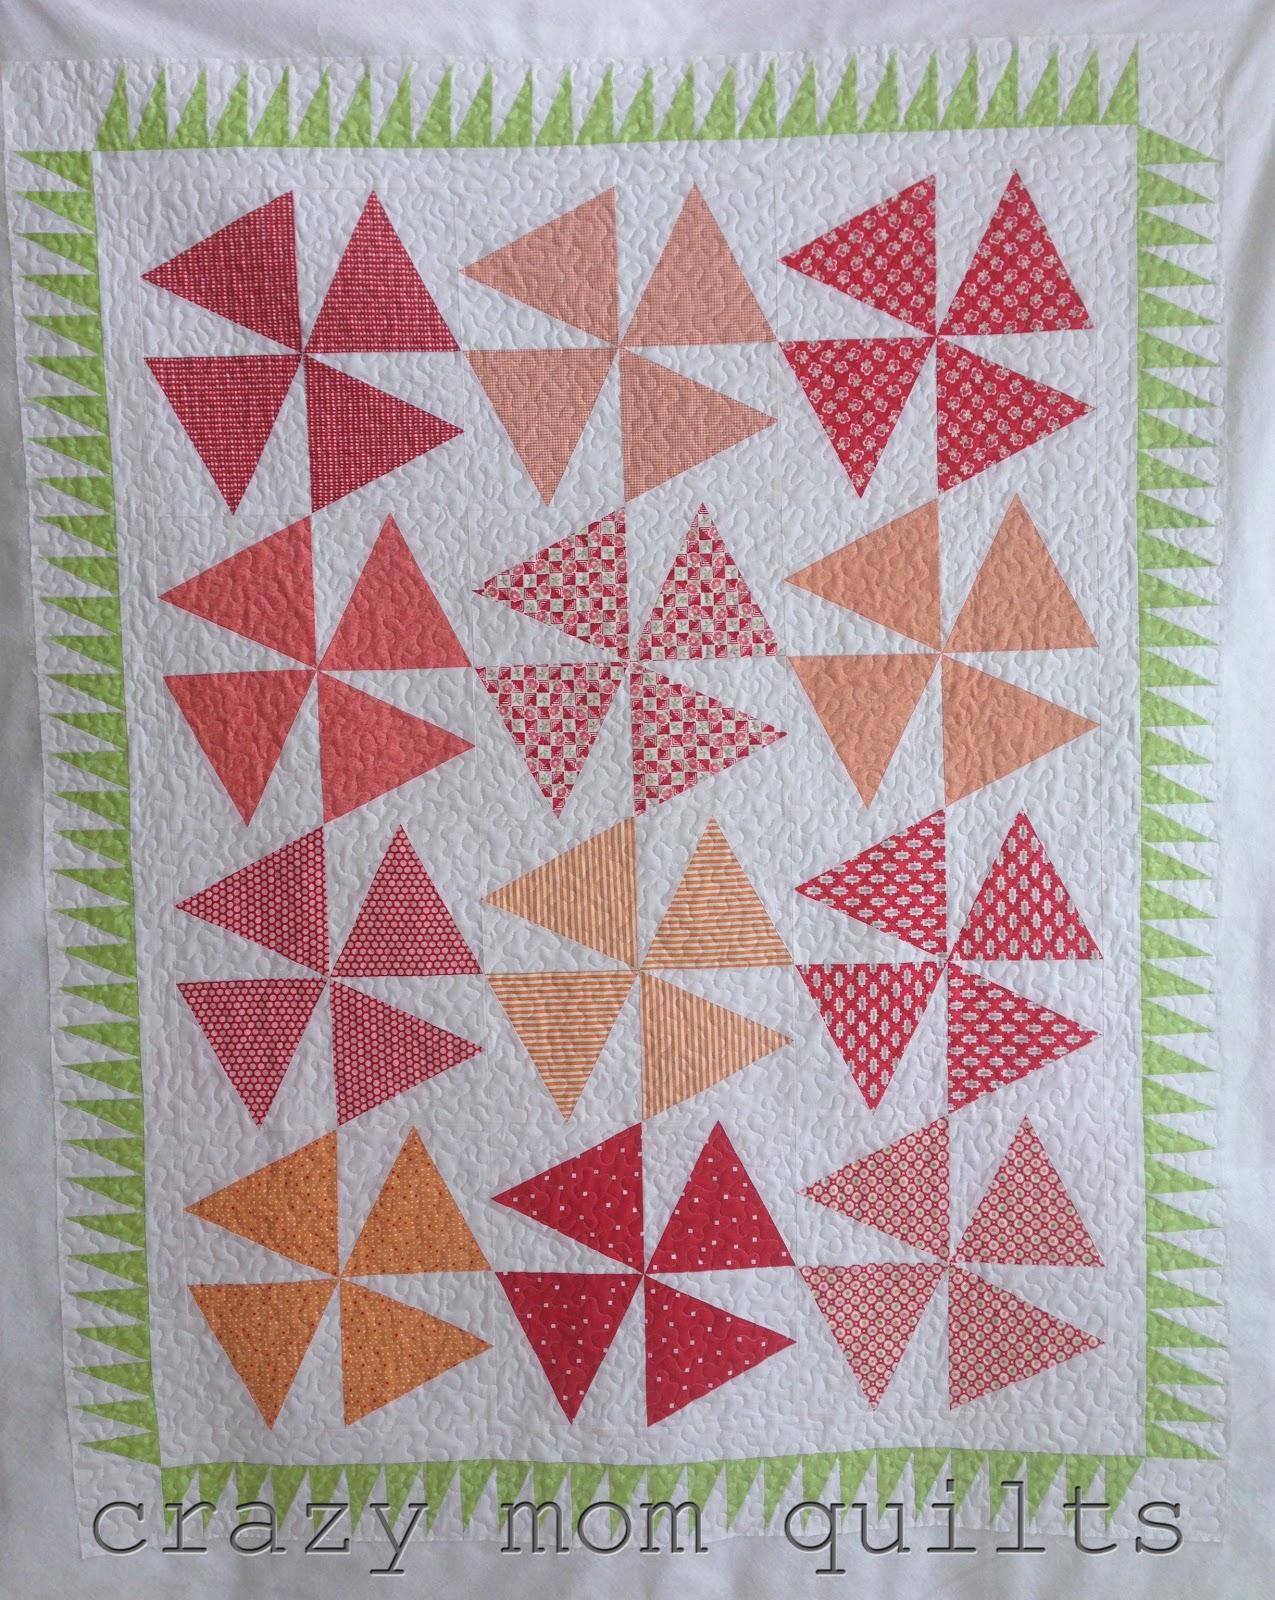 crazy mom quilts: Pam's quilt : crazy mom quilts - Adamdwight.com